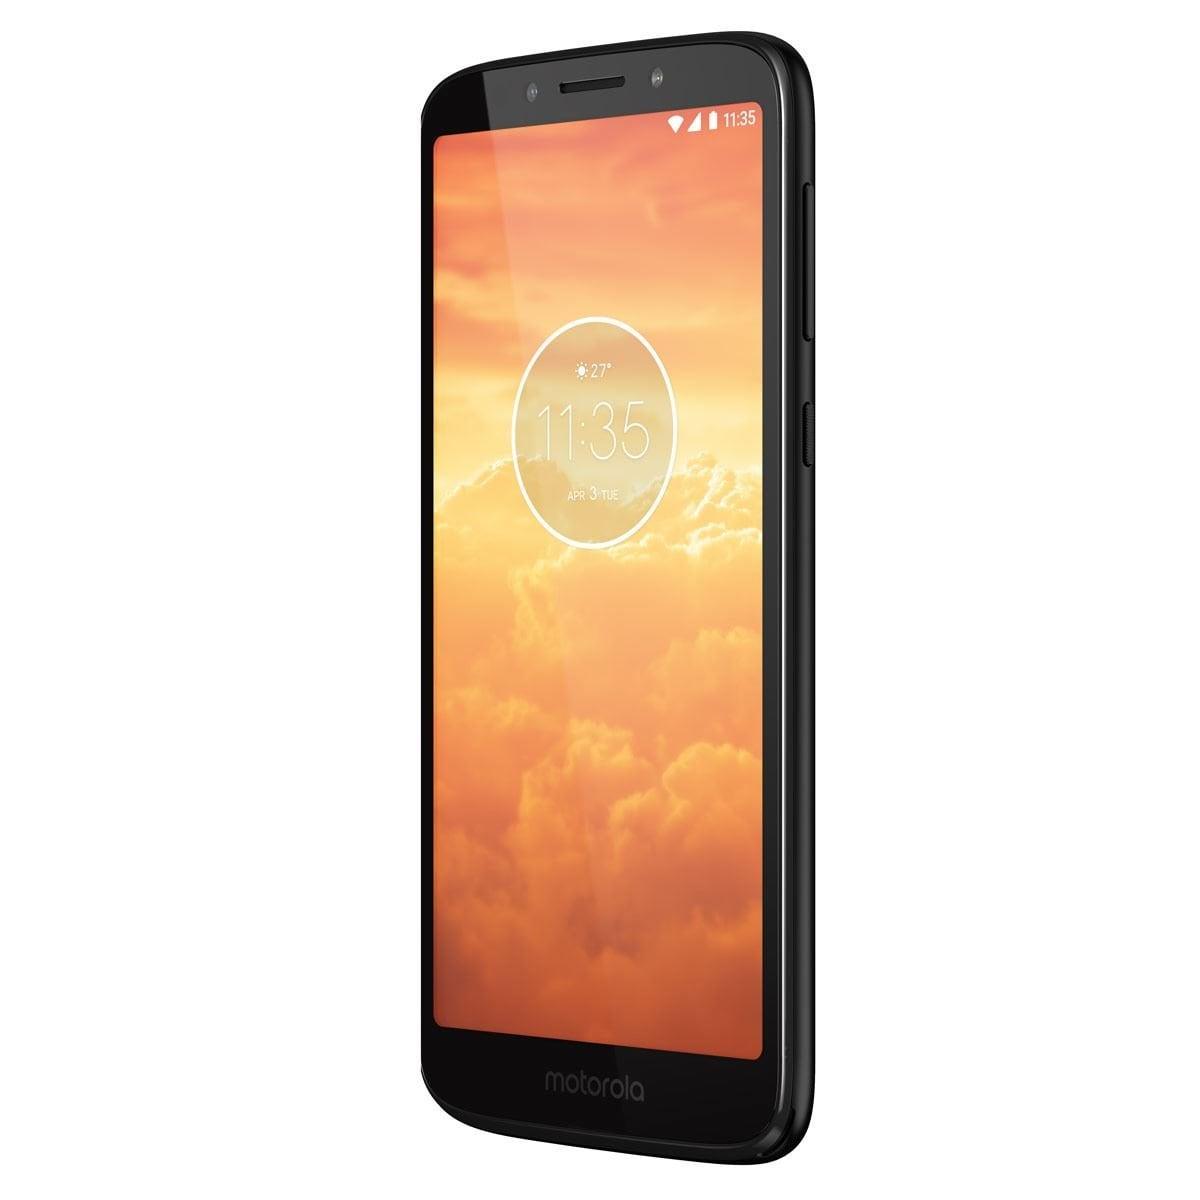 Celular Moto E5 Play Xt1920-18 Negro R9 (Telcel) Motorola